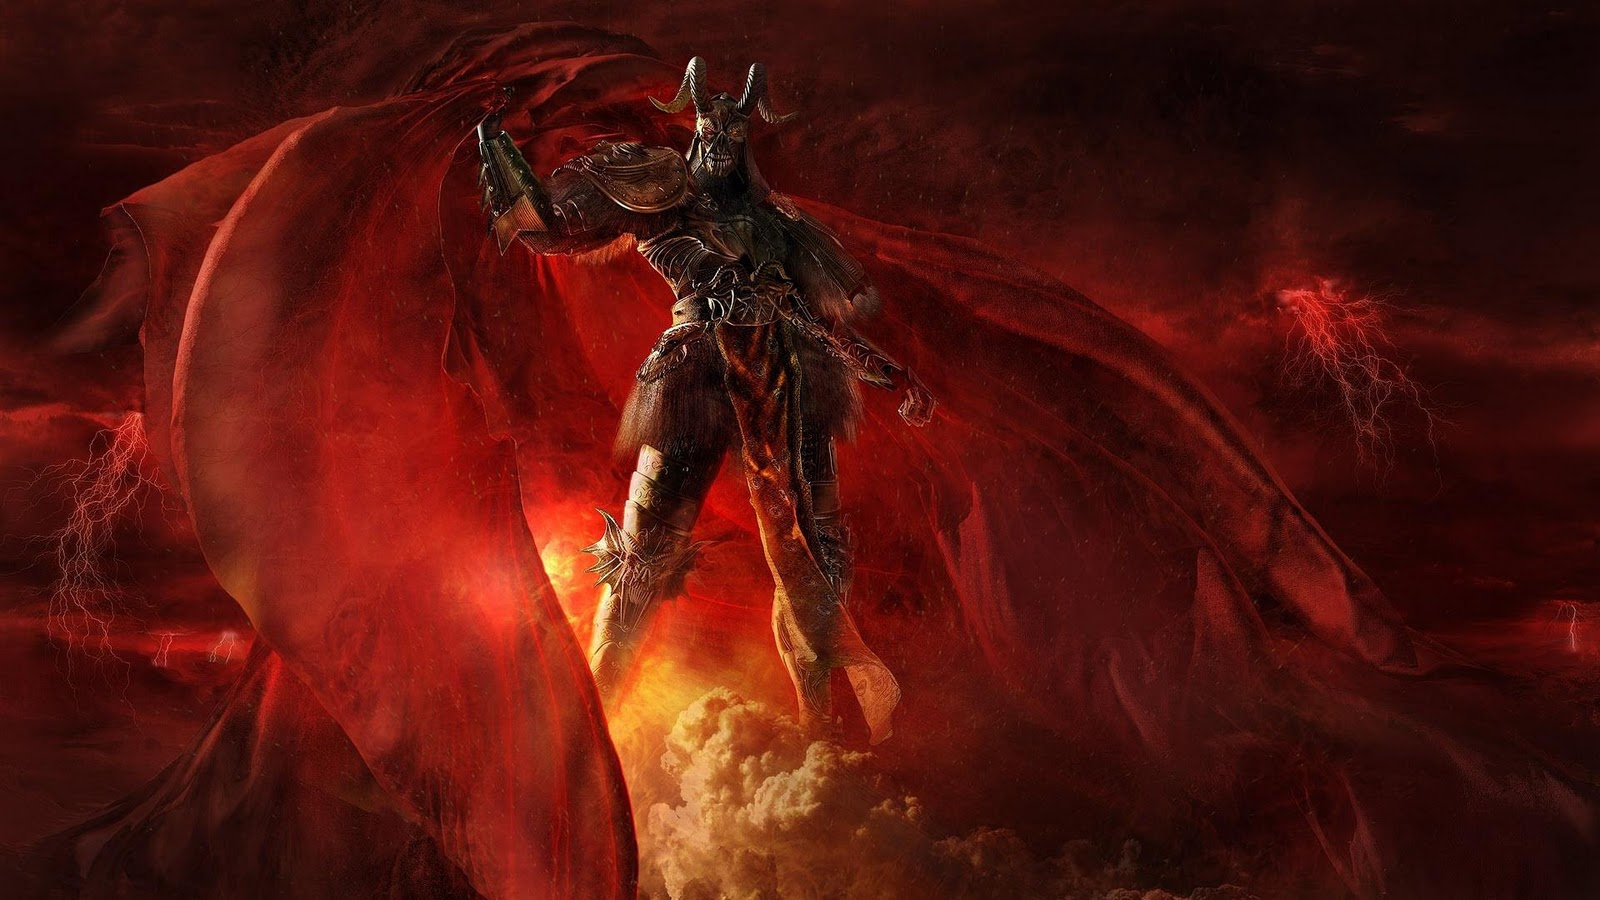 Satan Wallpaper Free Download Satan Wallpaper Free Blogger For